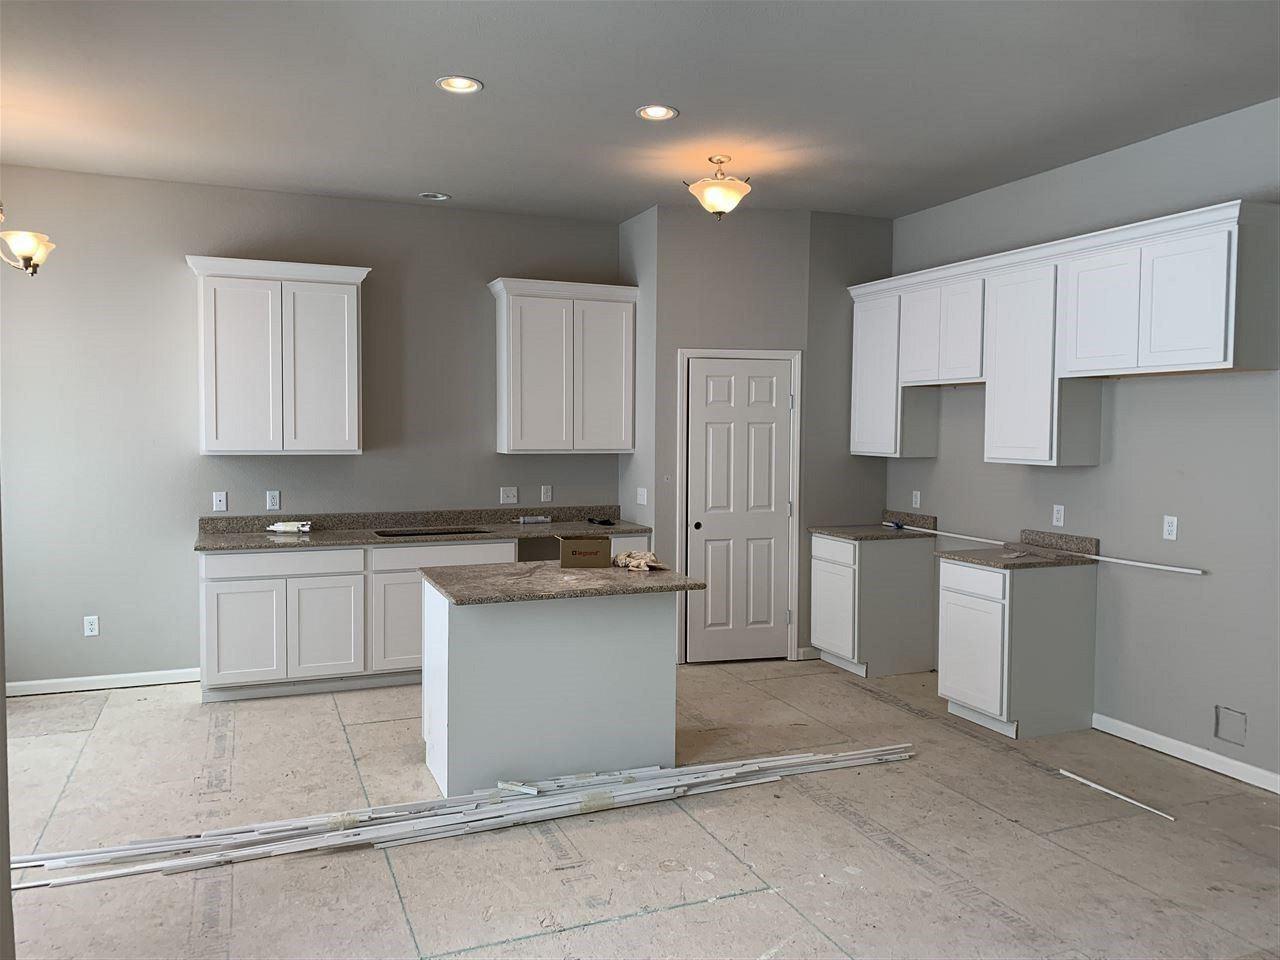 f_1920121_02 Real Estate in 53520 zip code